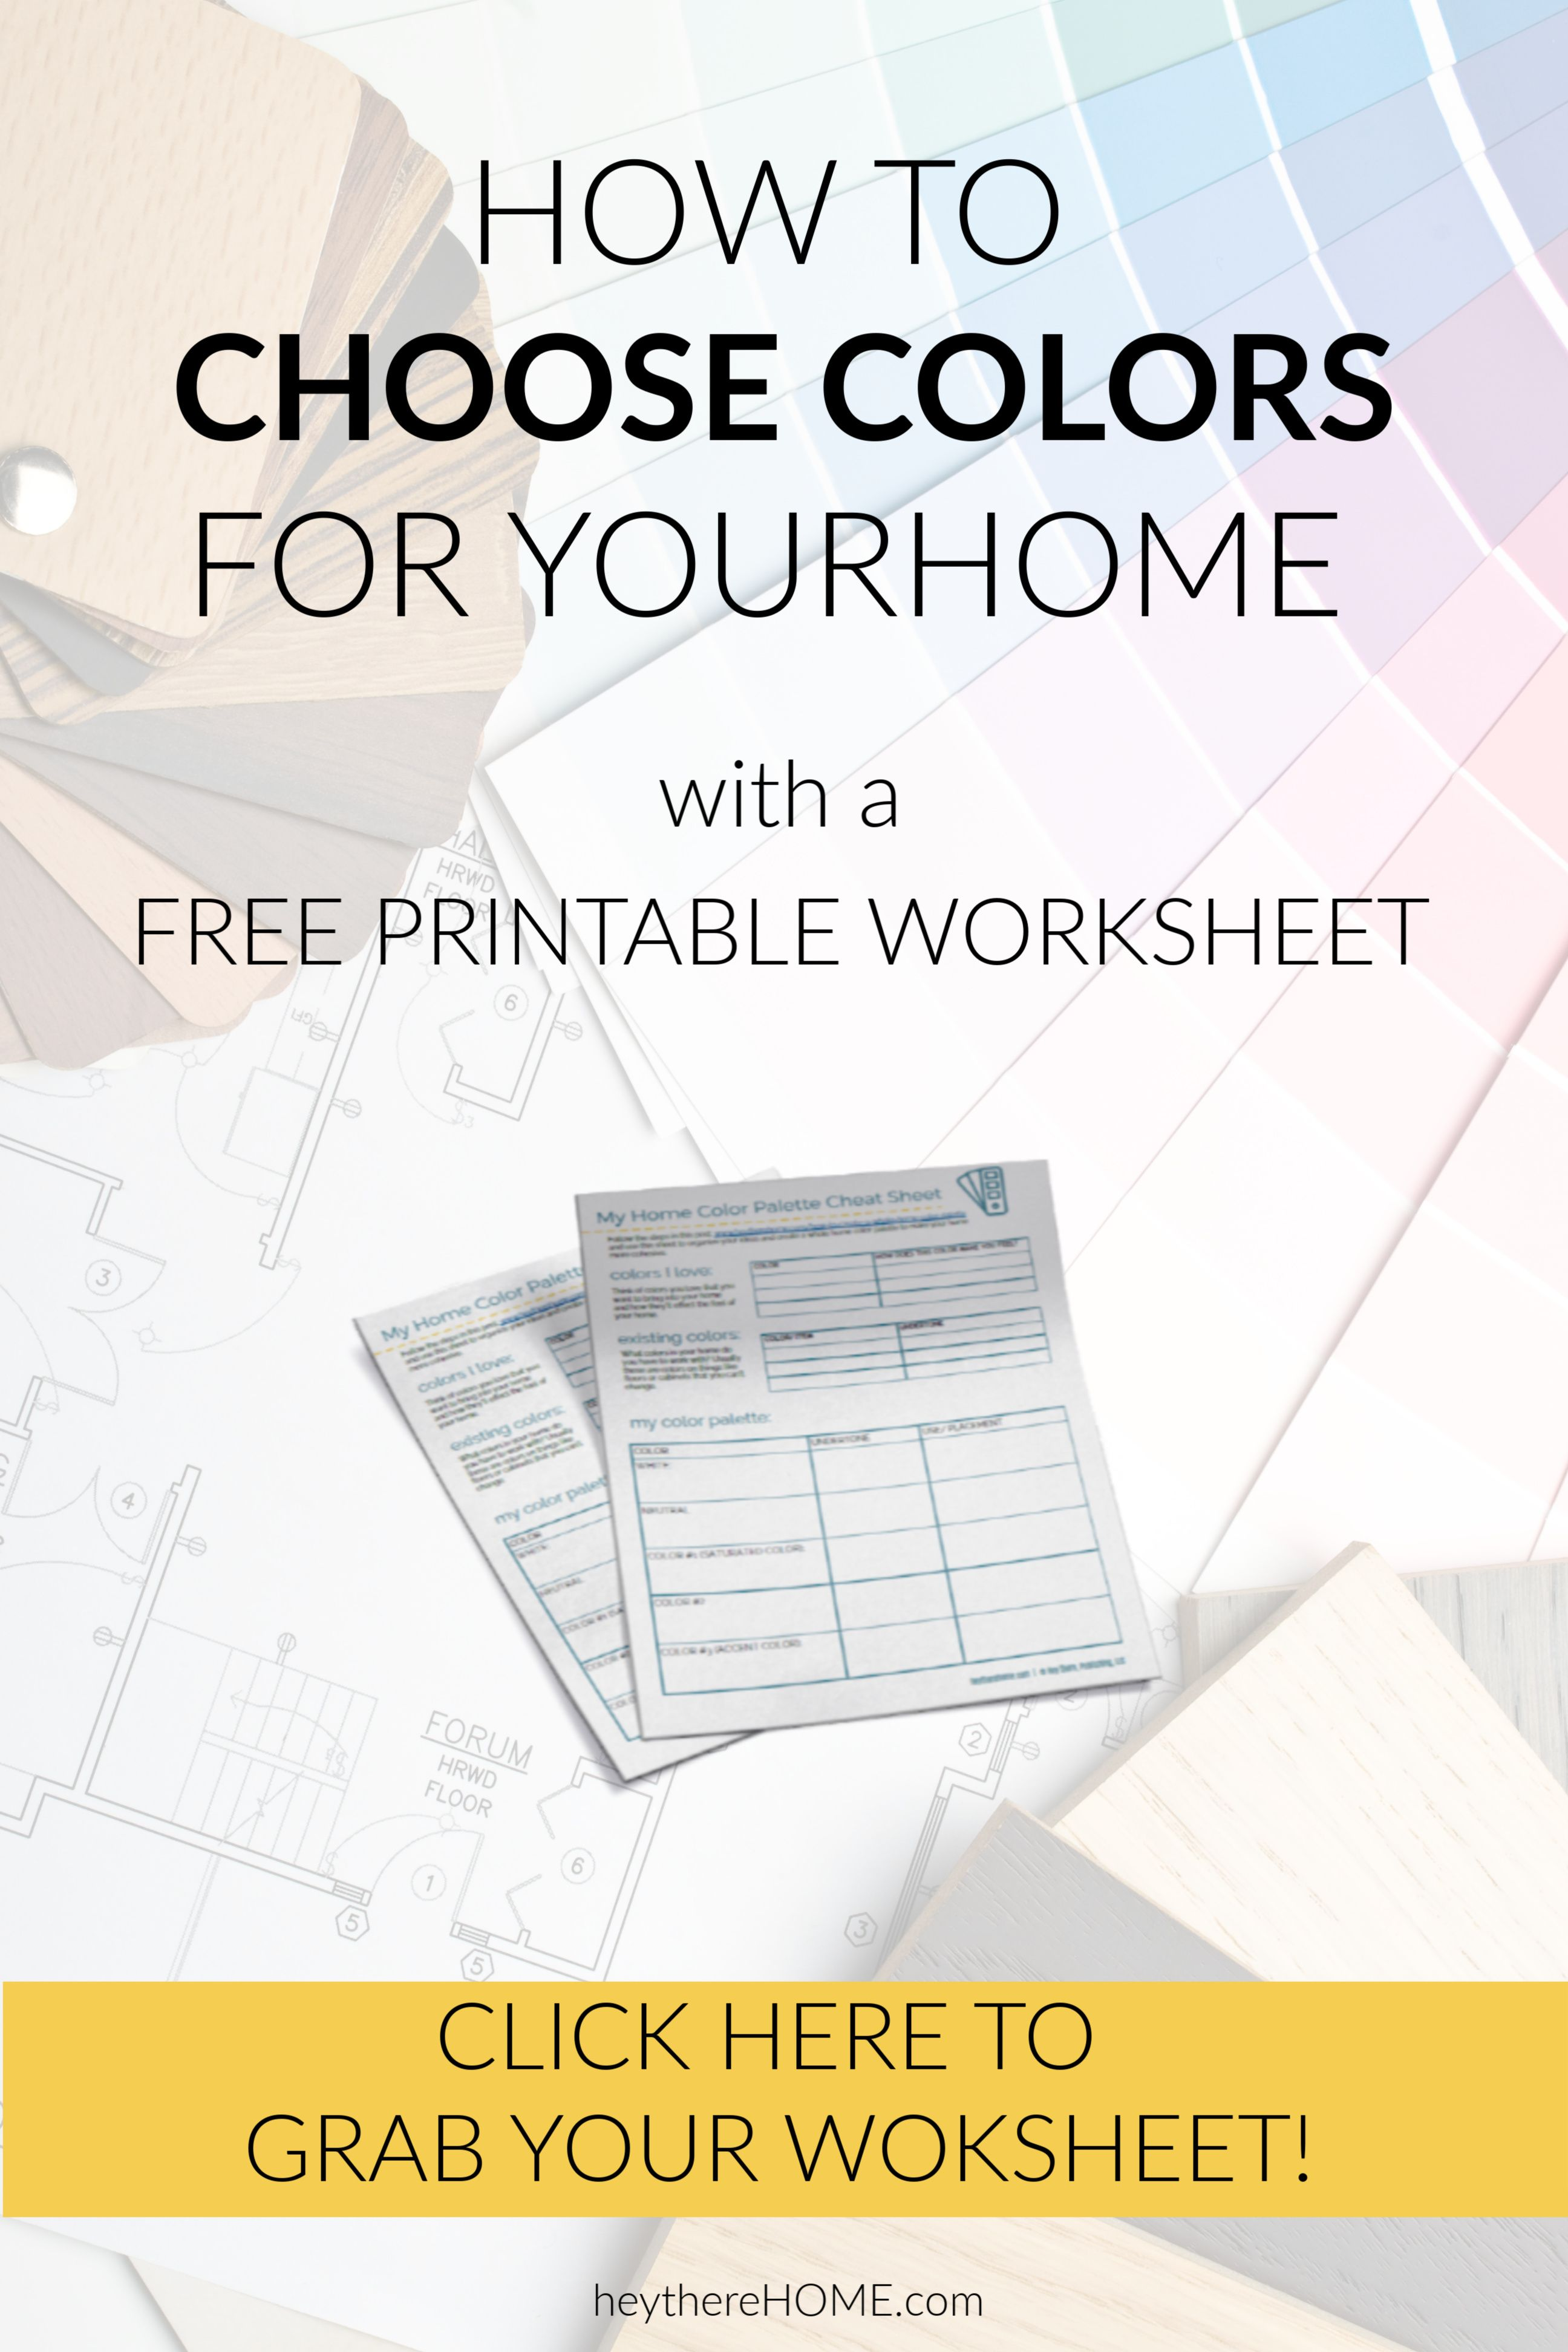 This Printable Worksheet Makes It So Stress Free To Choose